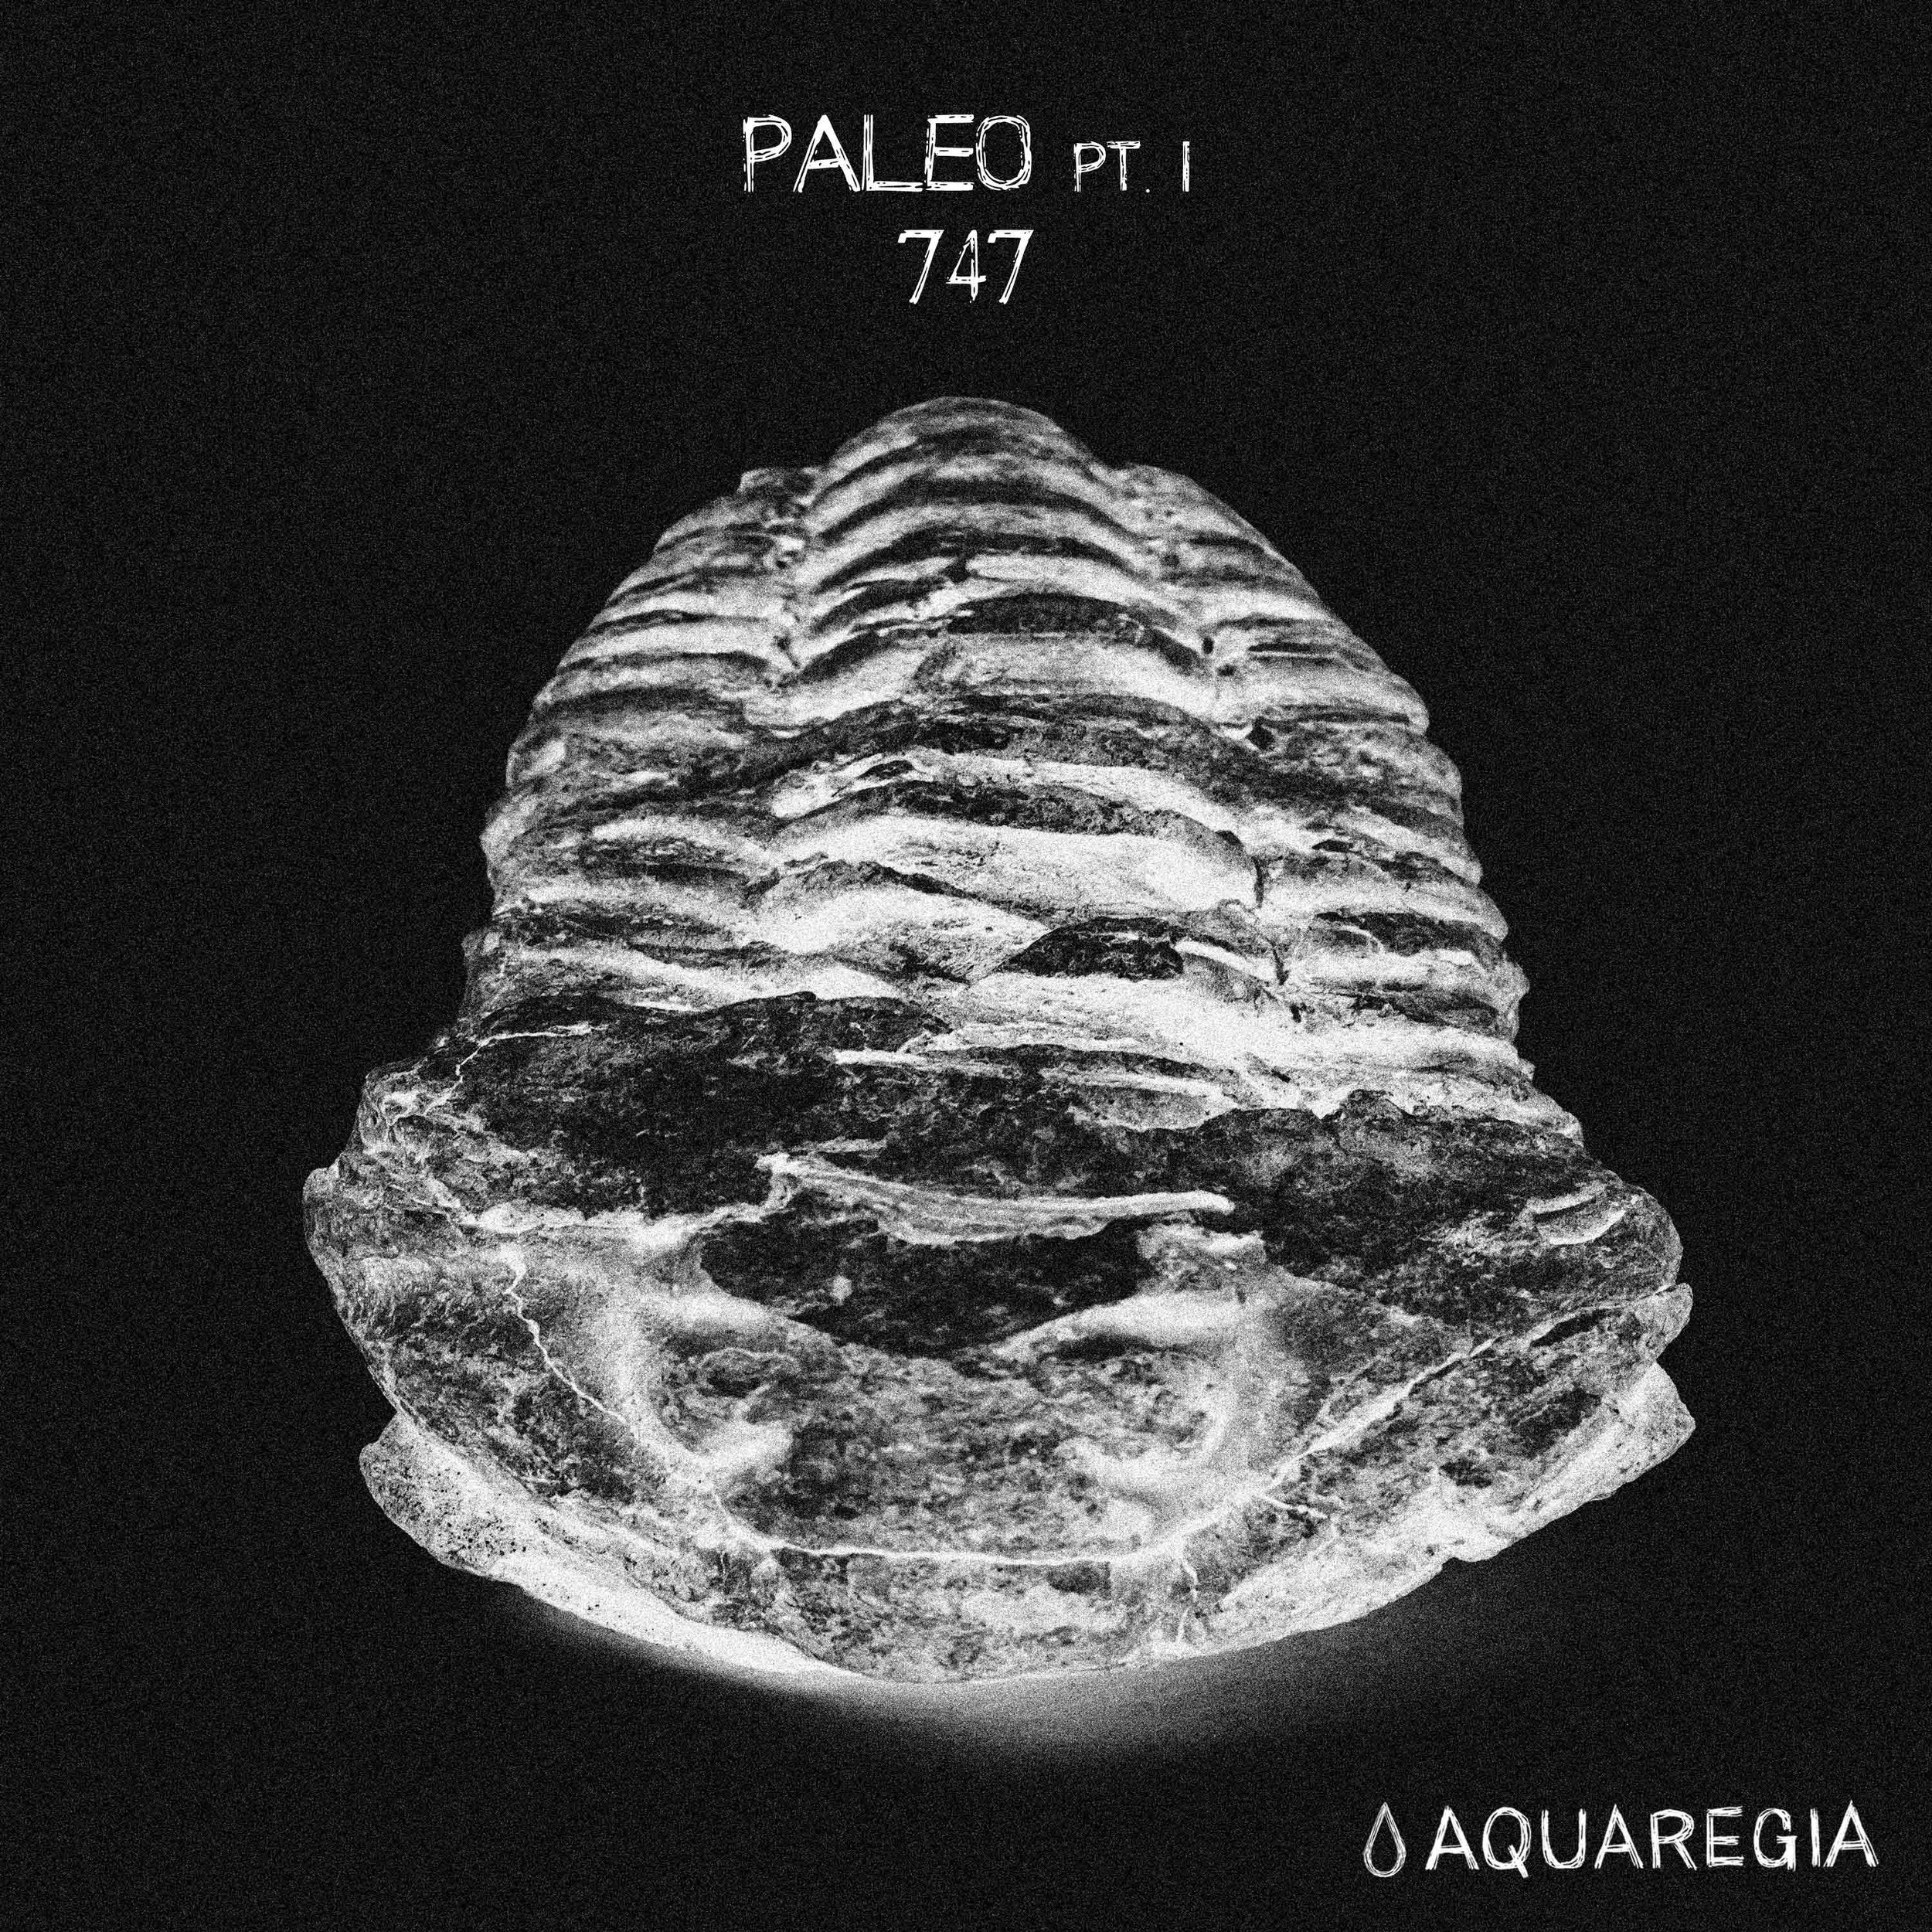 747 - Paleo Pt. I EP [AQR007]